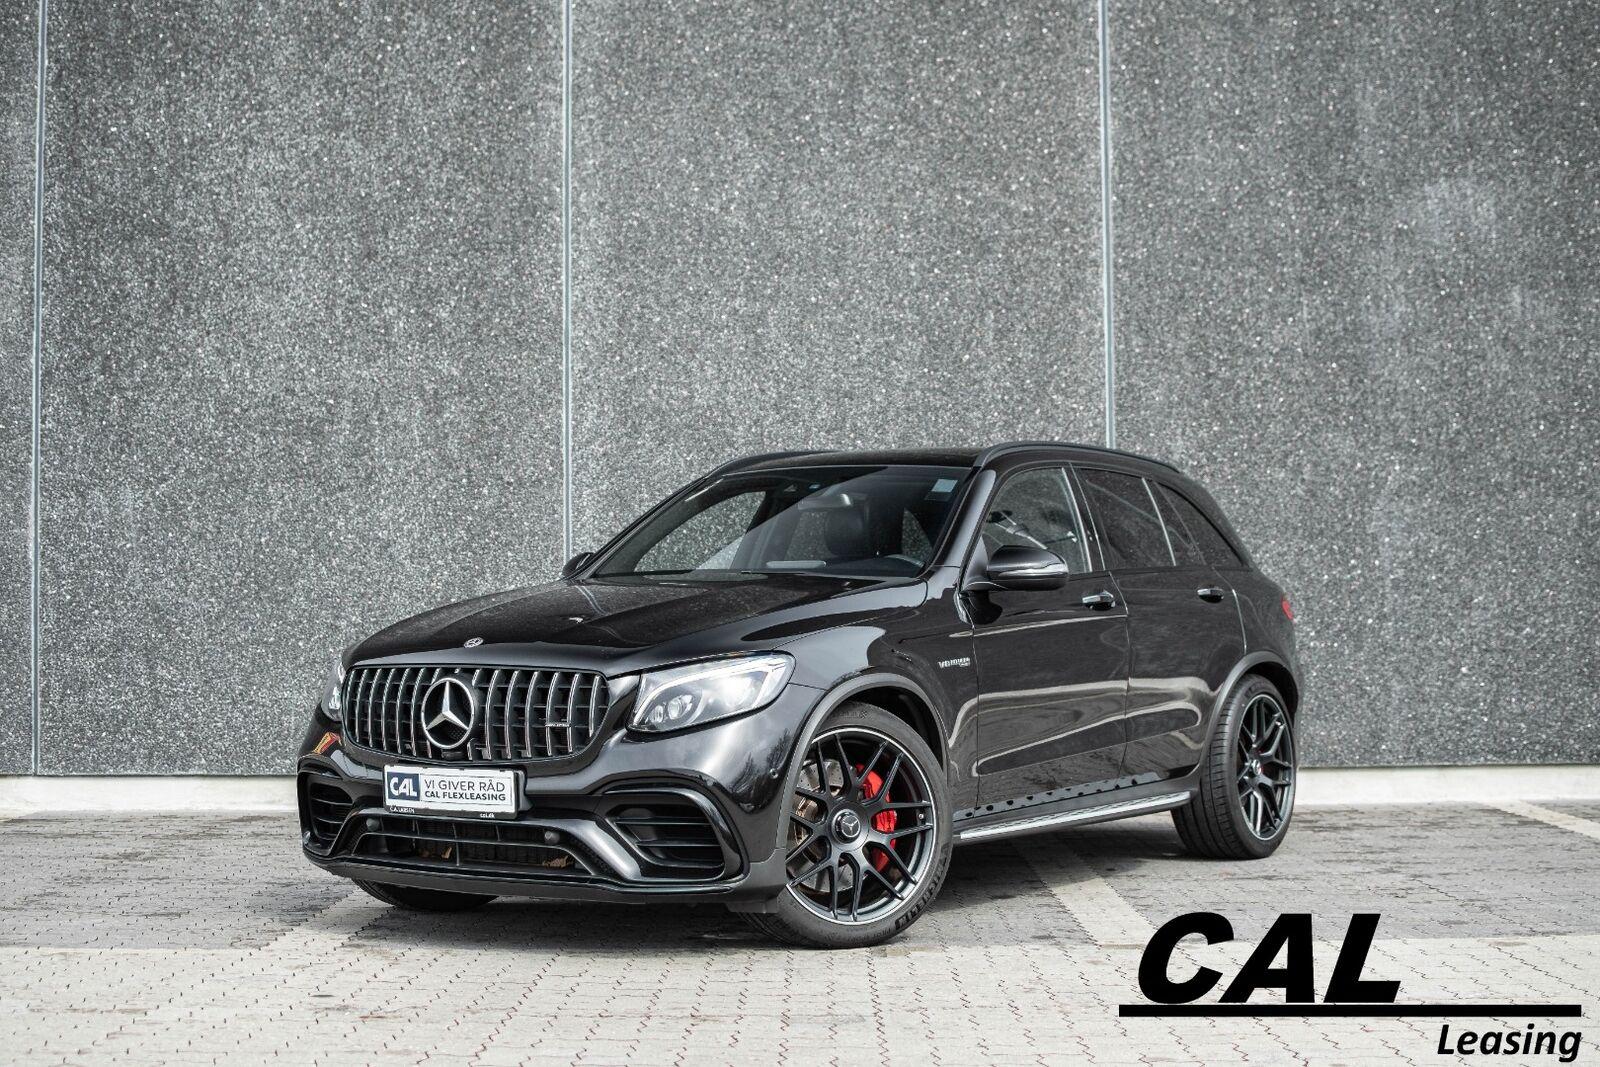 Mercedes GLC63 4,0 AMG S aut. 4Matic+ 5d - 1.499.900 kr.